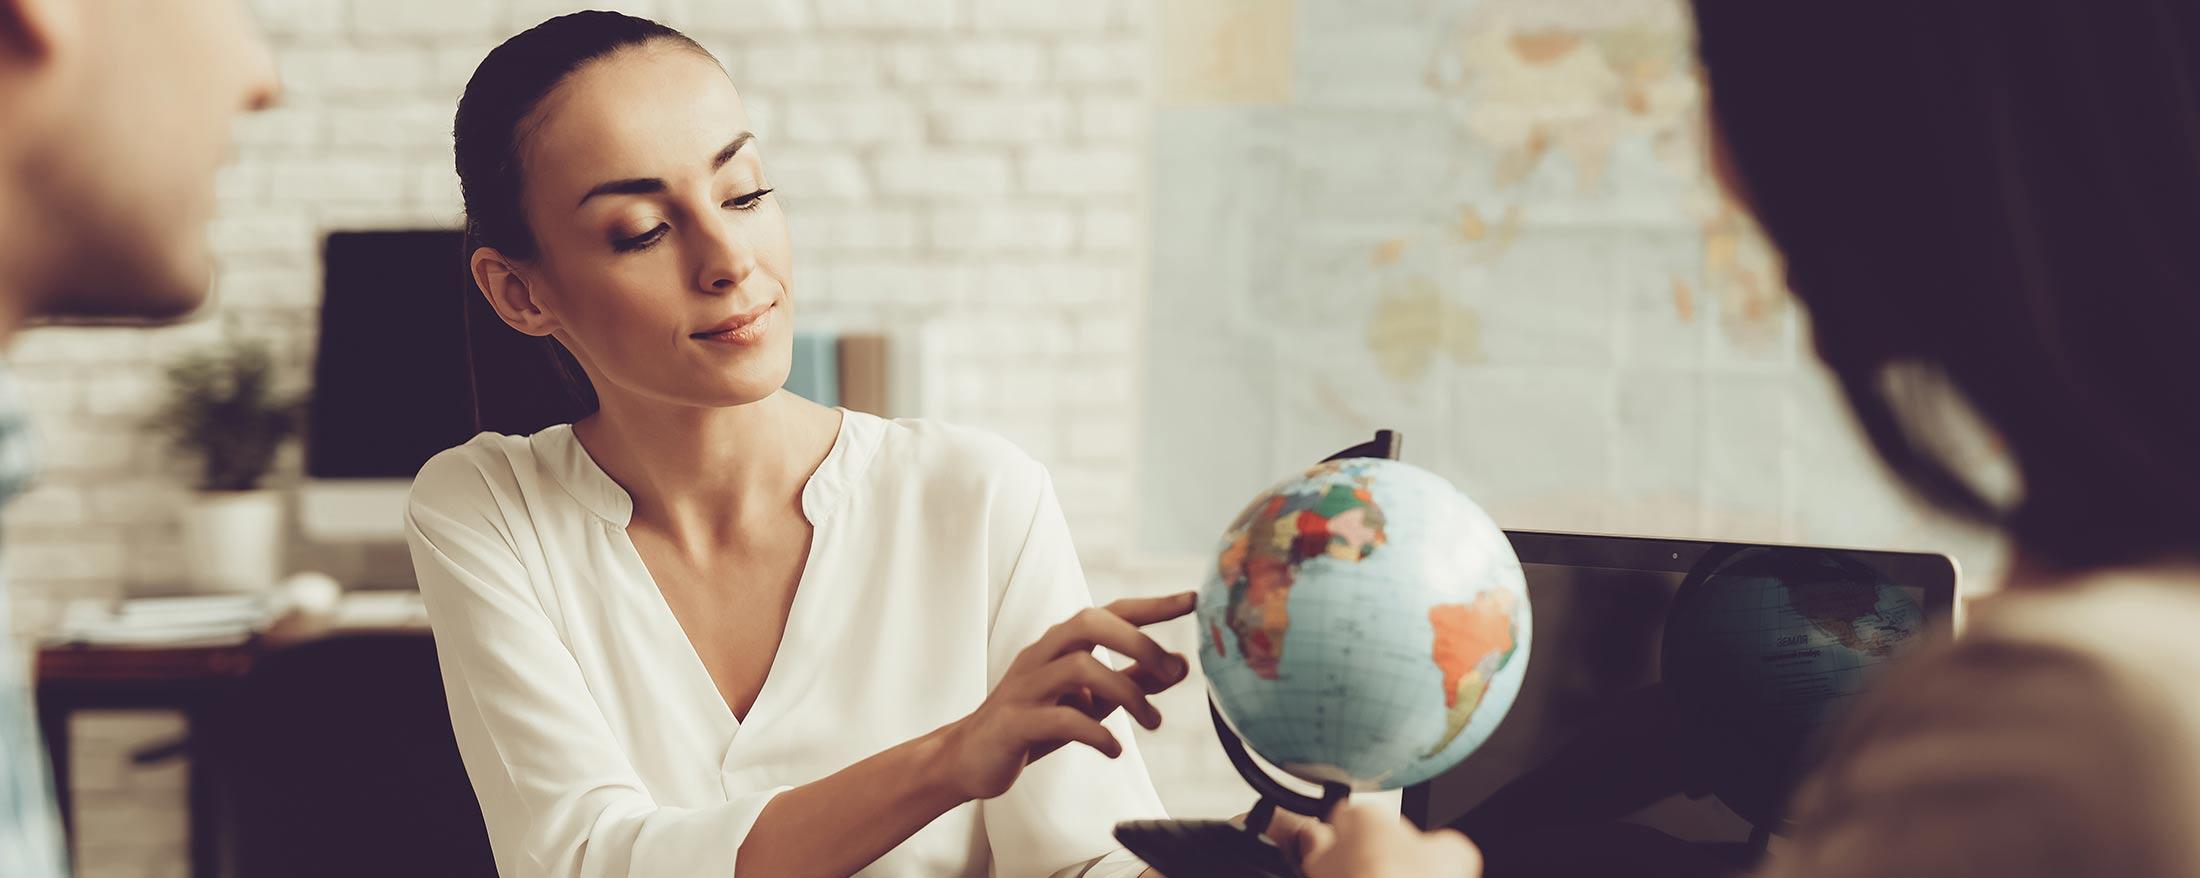 agenzia-viaggi-lista-online-agift